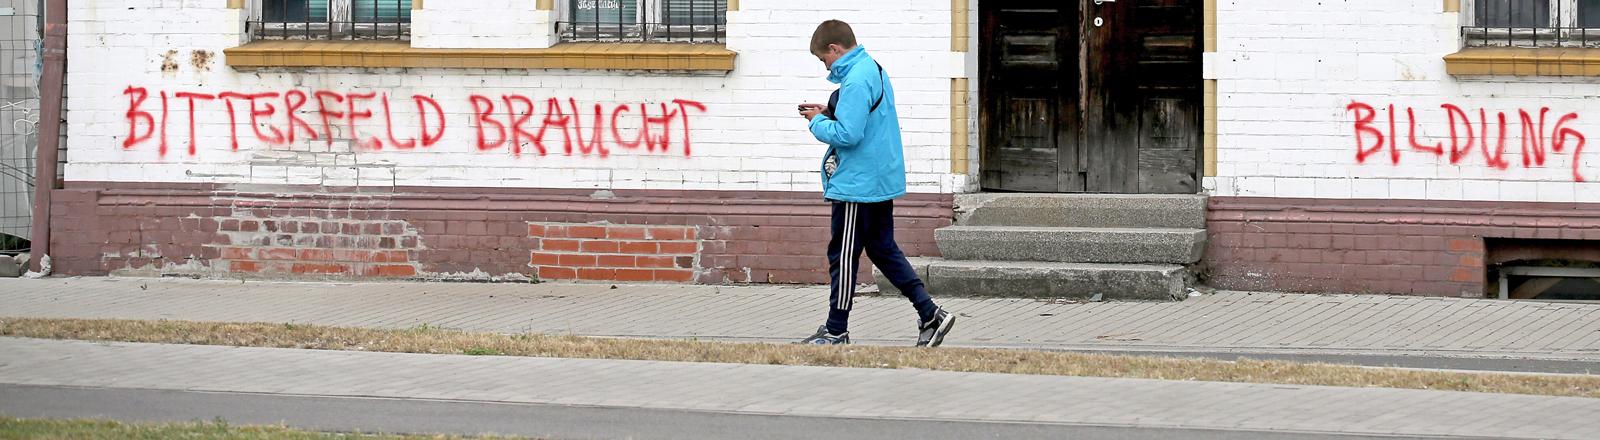 "Straßenszene in Bitterfeld. Grafitti auf Hauswand ""Bitterfeld braucht Bildung"". Bild: dpa"